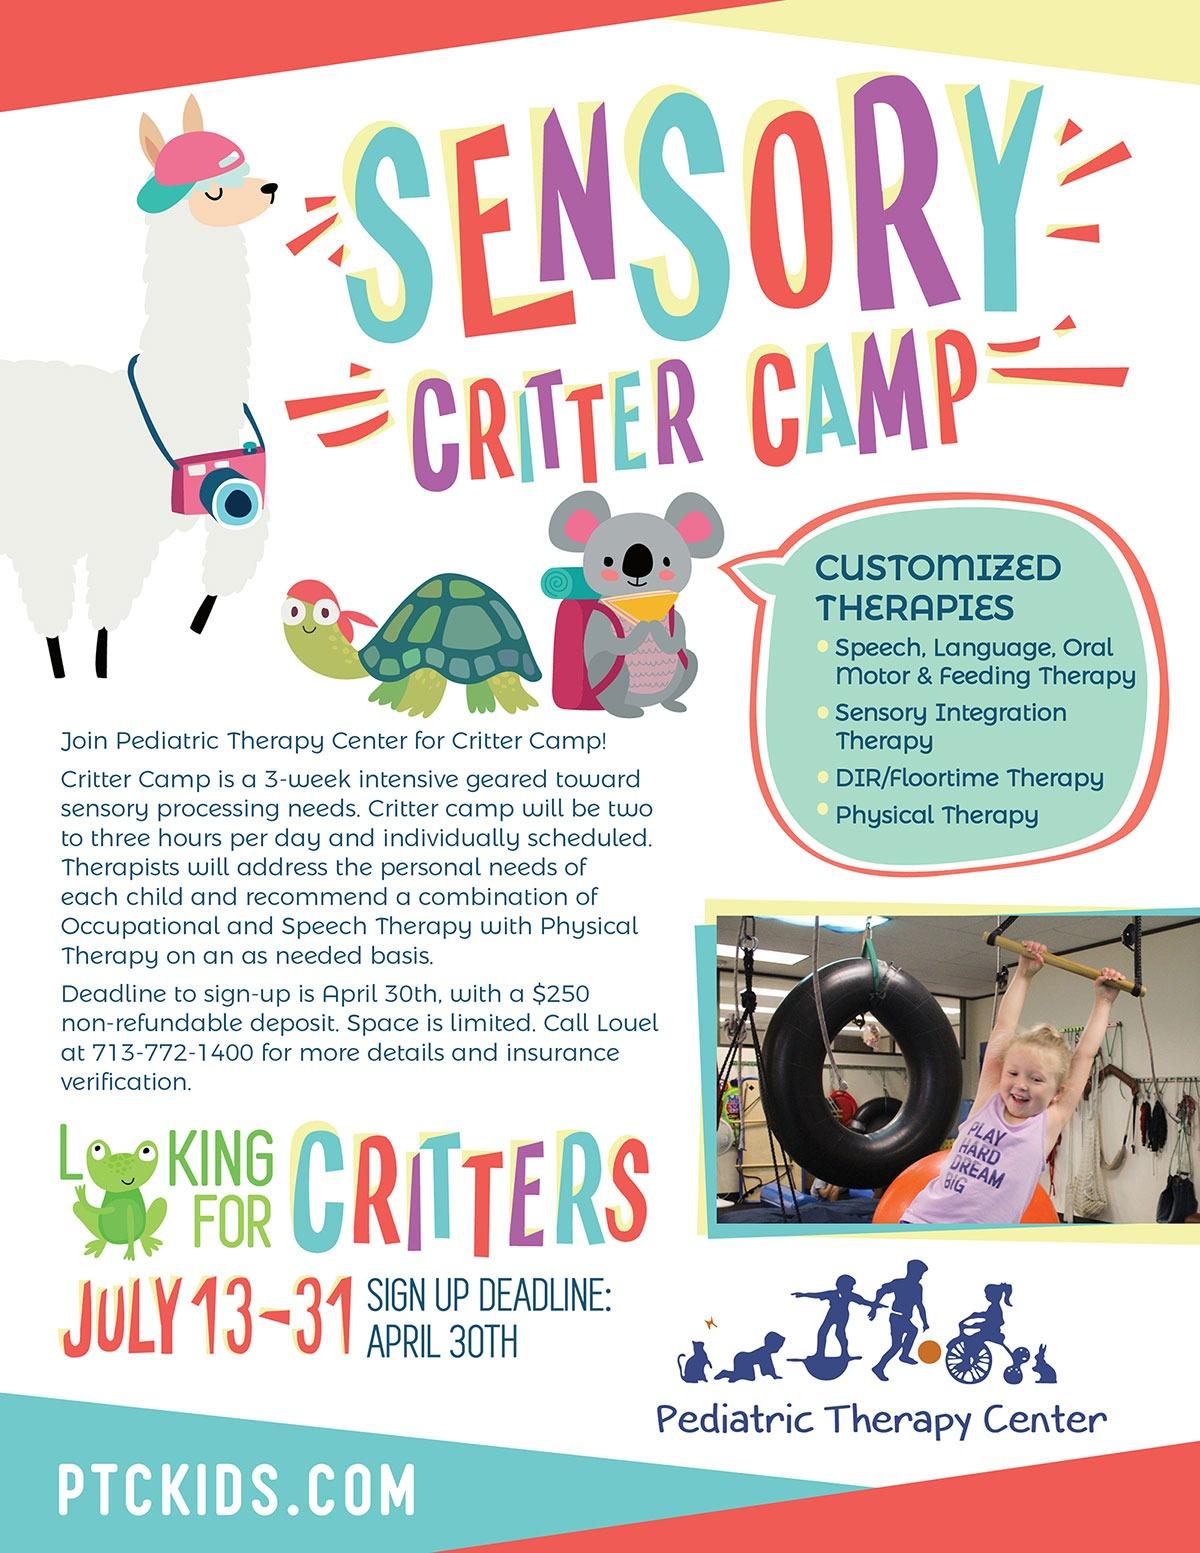 Sensory Critter Camp